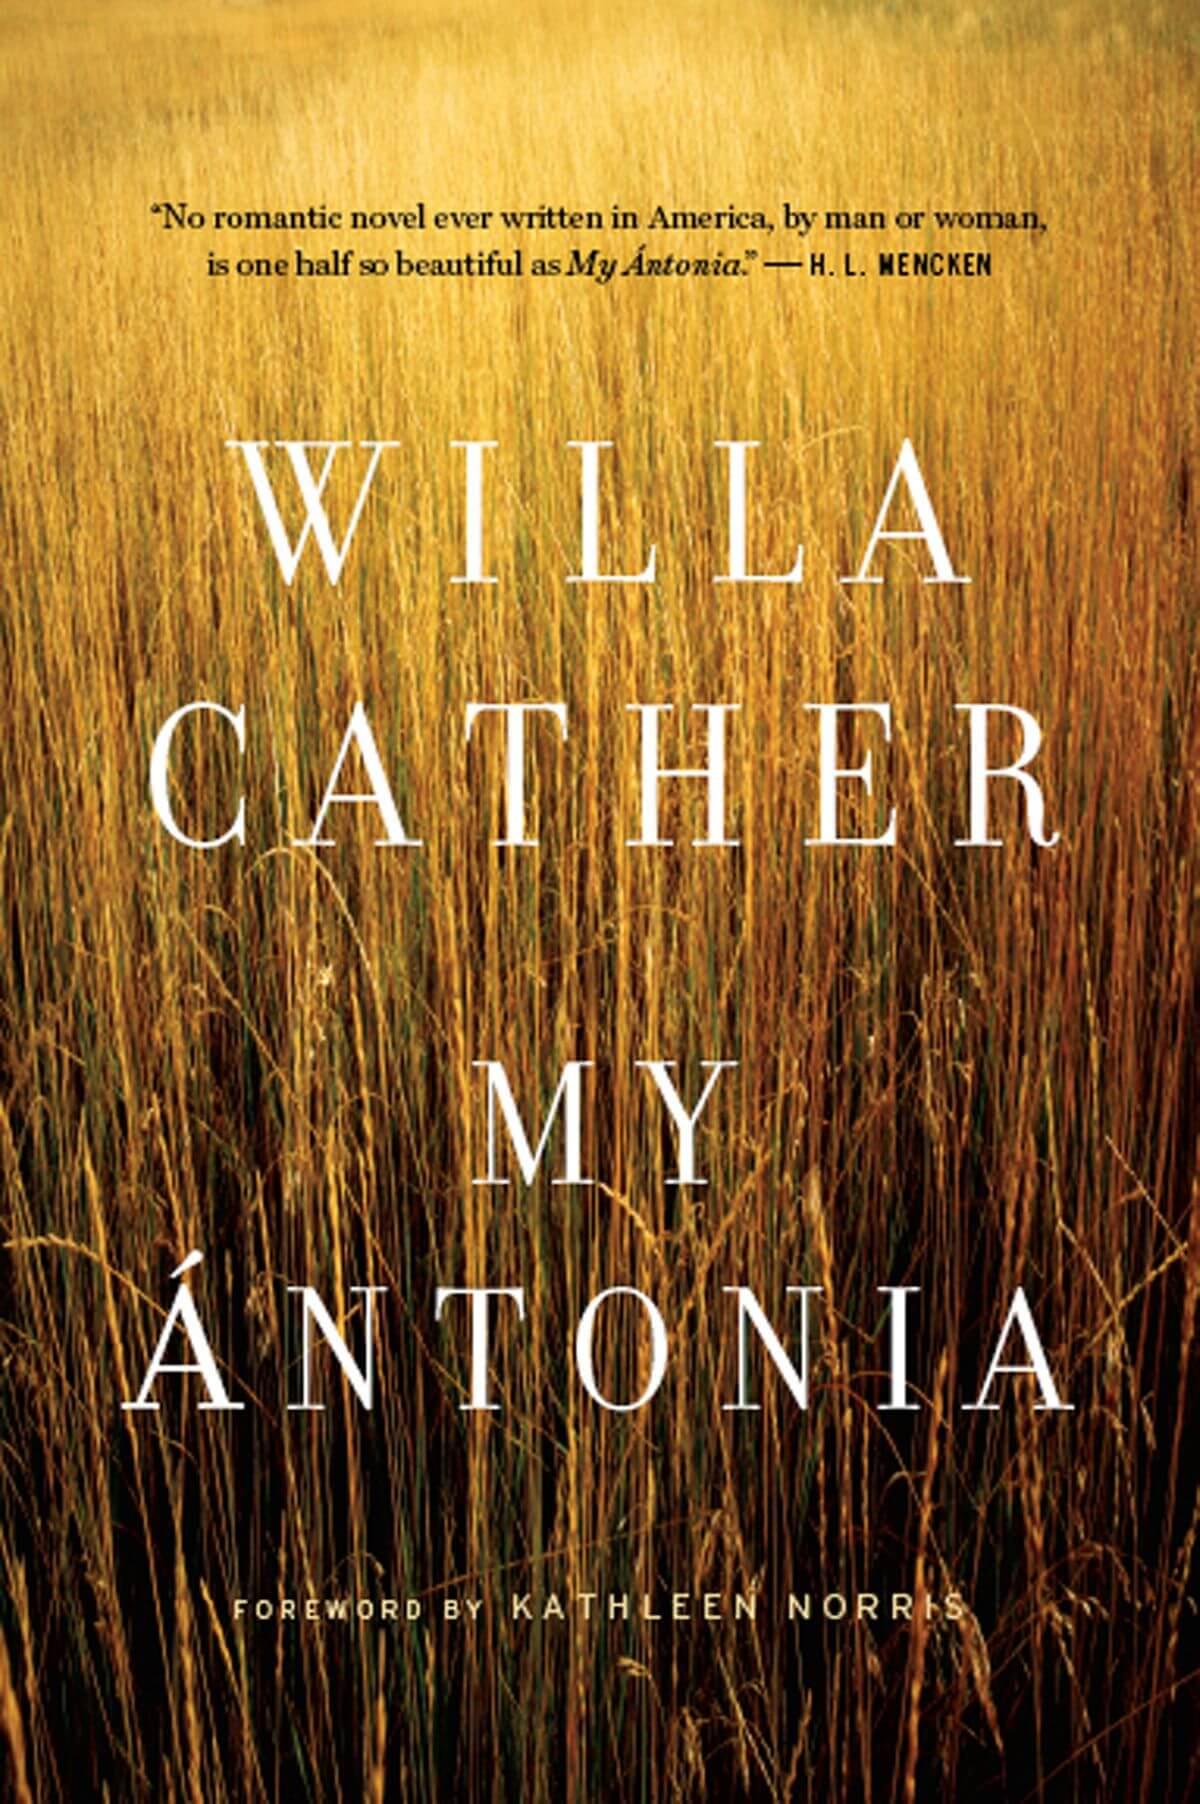 My Antonia book cover image